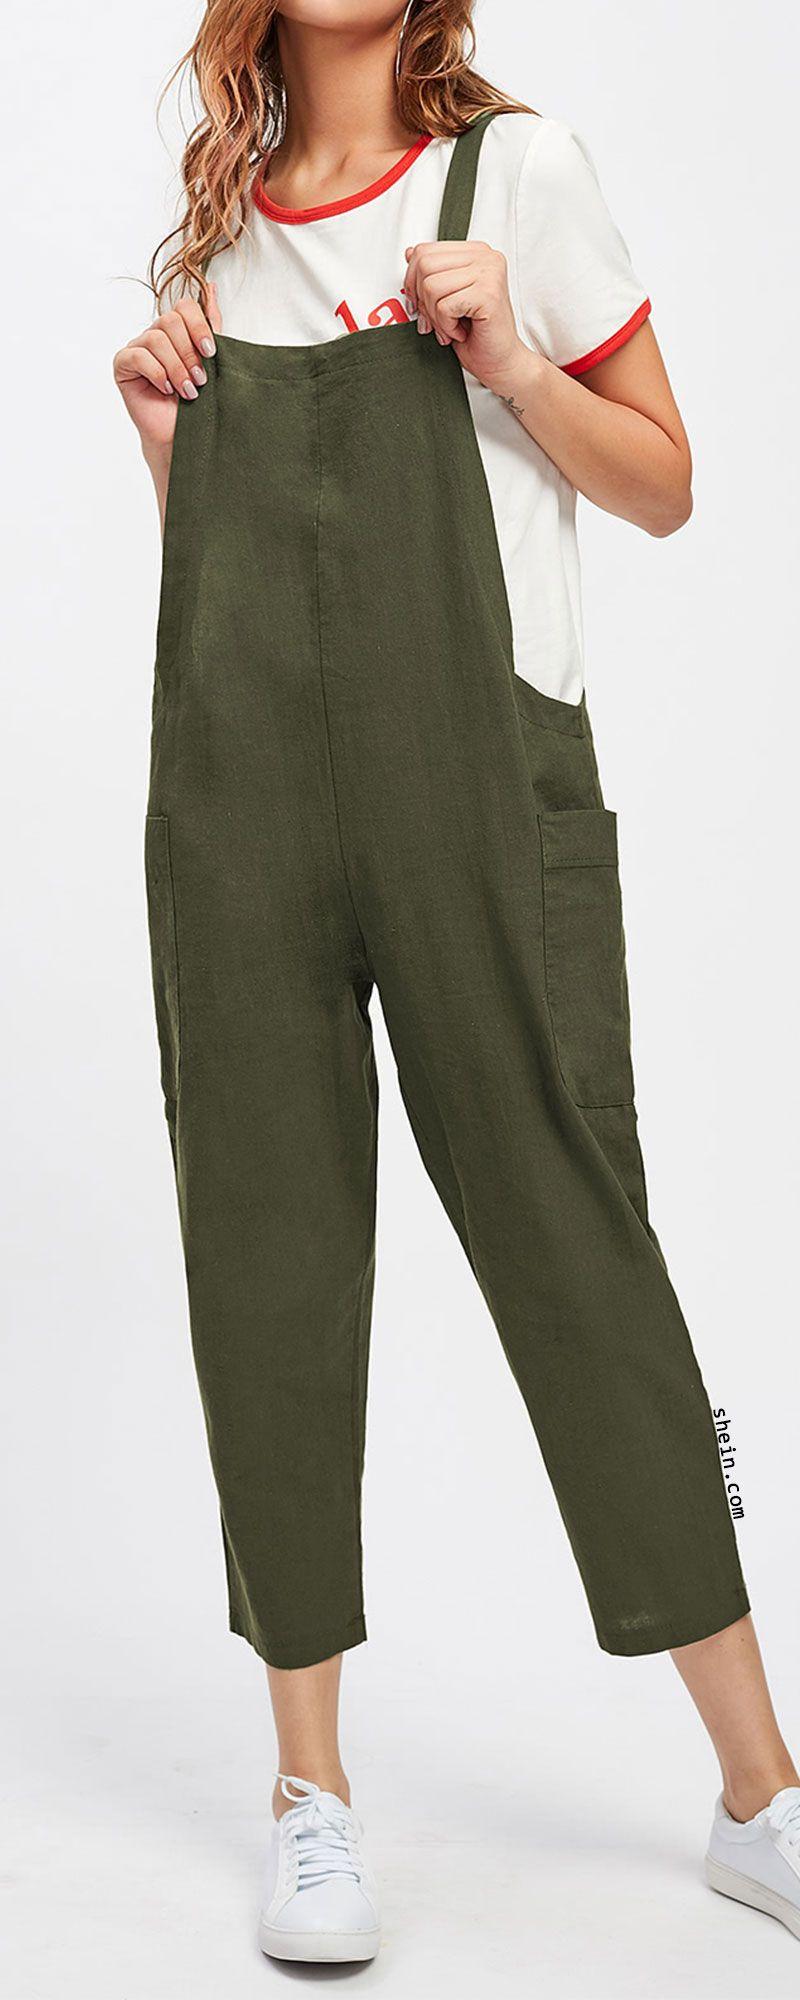 Pocket Side Overall Pants  51d616dc8095e